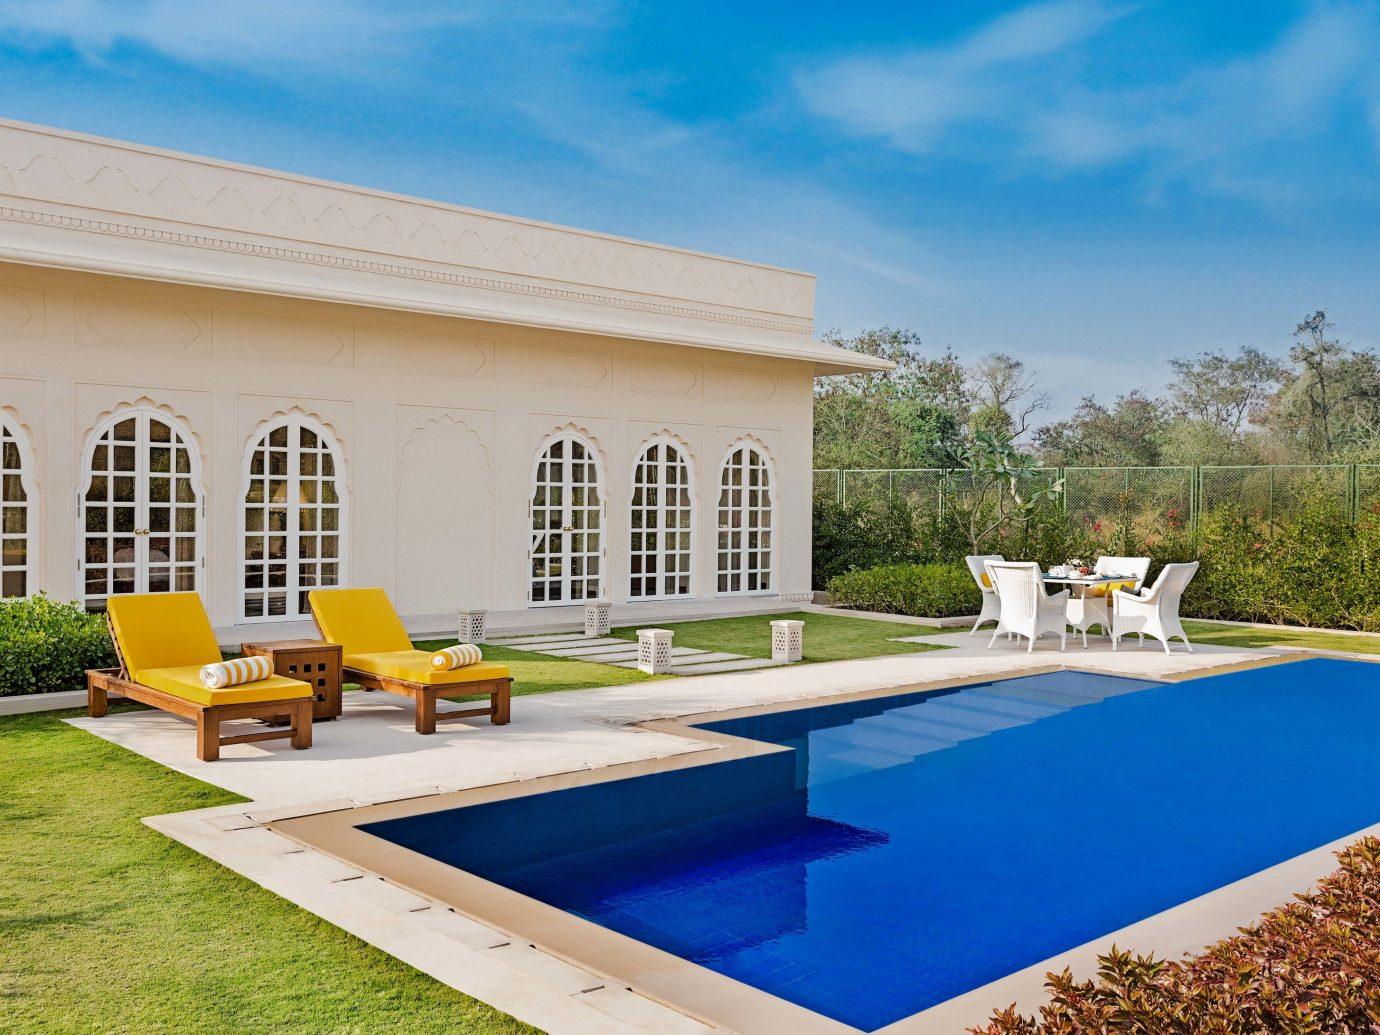 property estate swimming pool Villa real estate leisure home house hacienda Resort backyard facade amenity grass